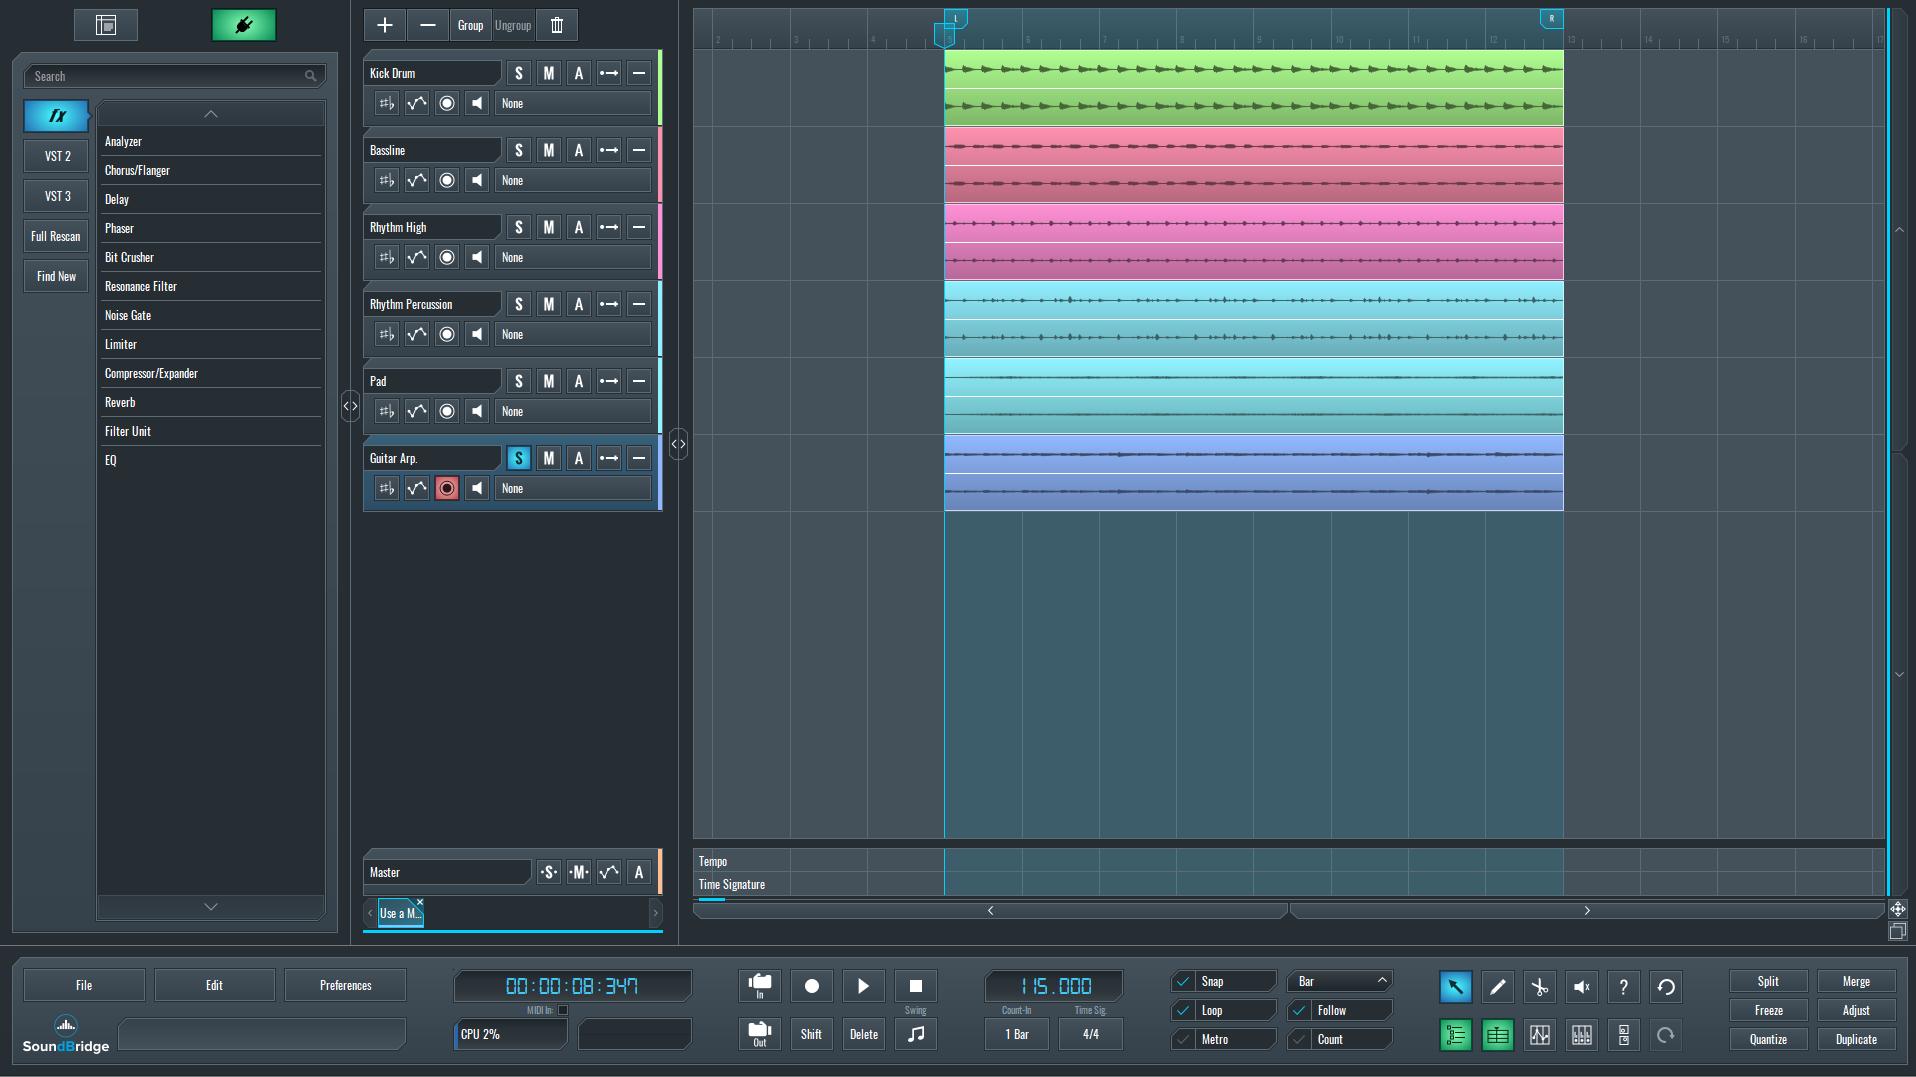 SoundBridge DAW for multi-effect processor on guitar.